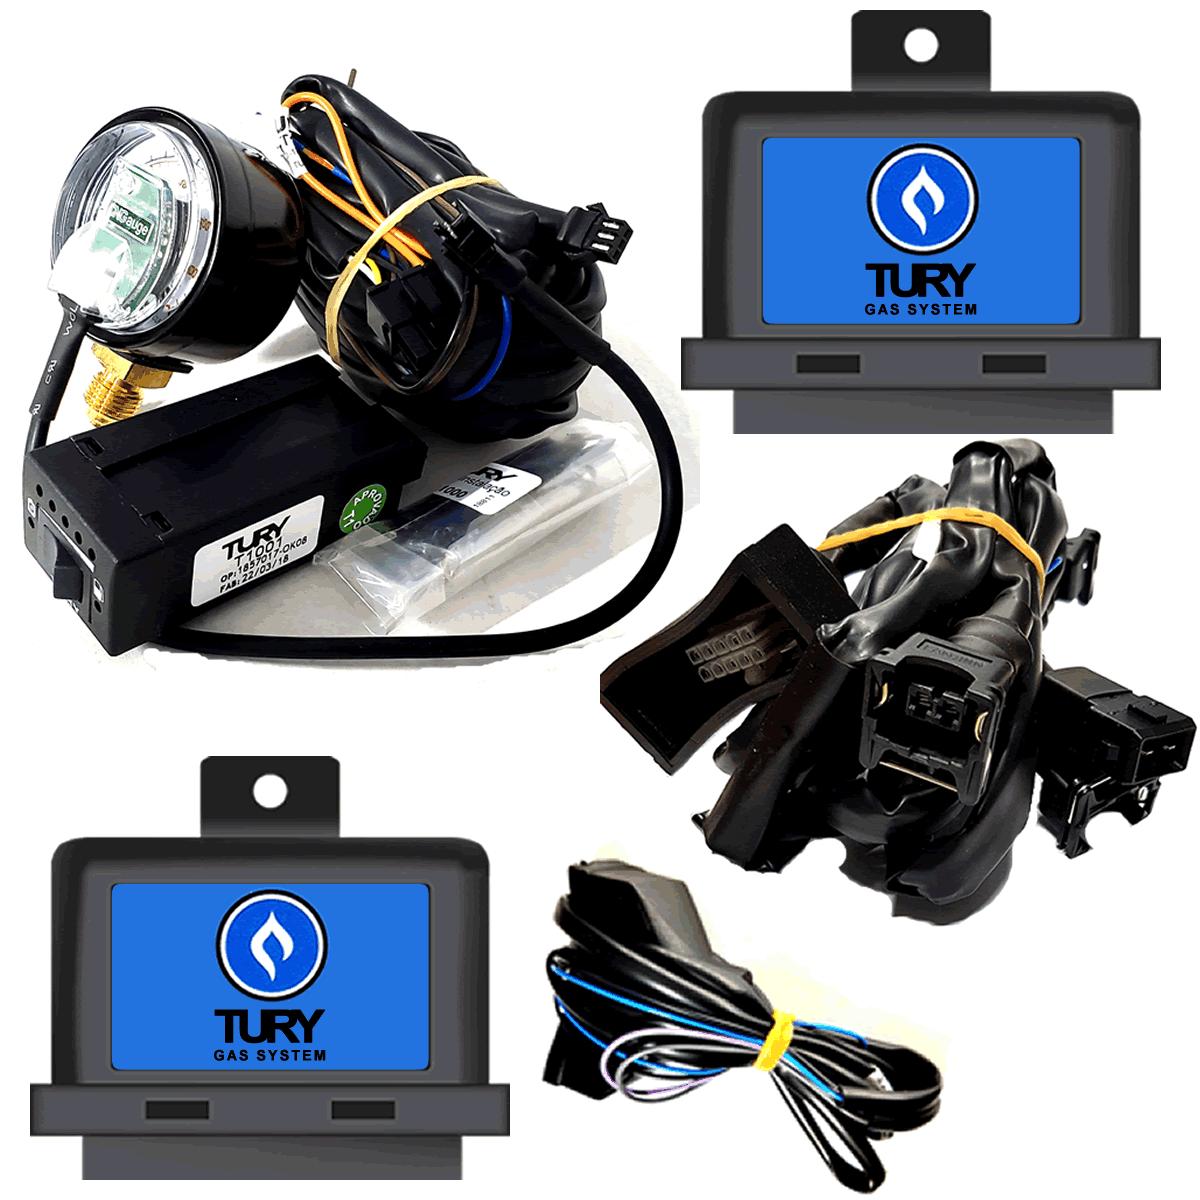 Conjunto Elétrico GNV Comutadora T1001 Emulador T54A Simulador T63 Universal